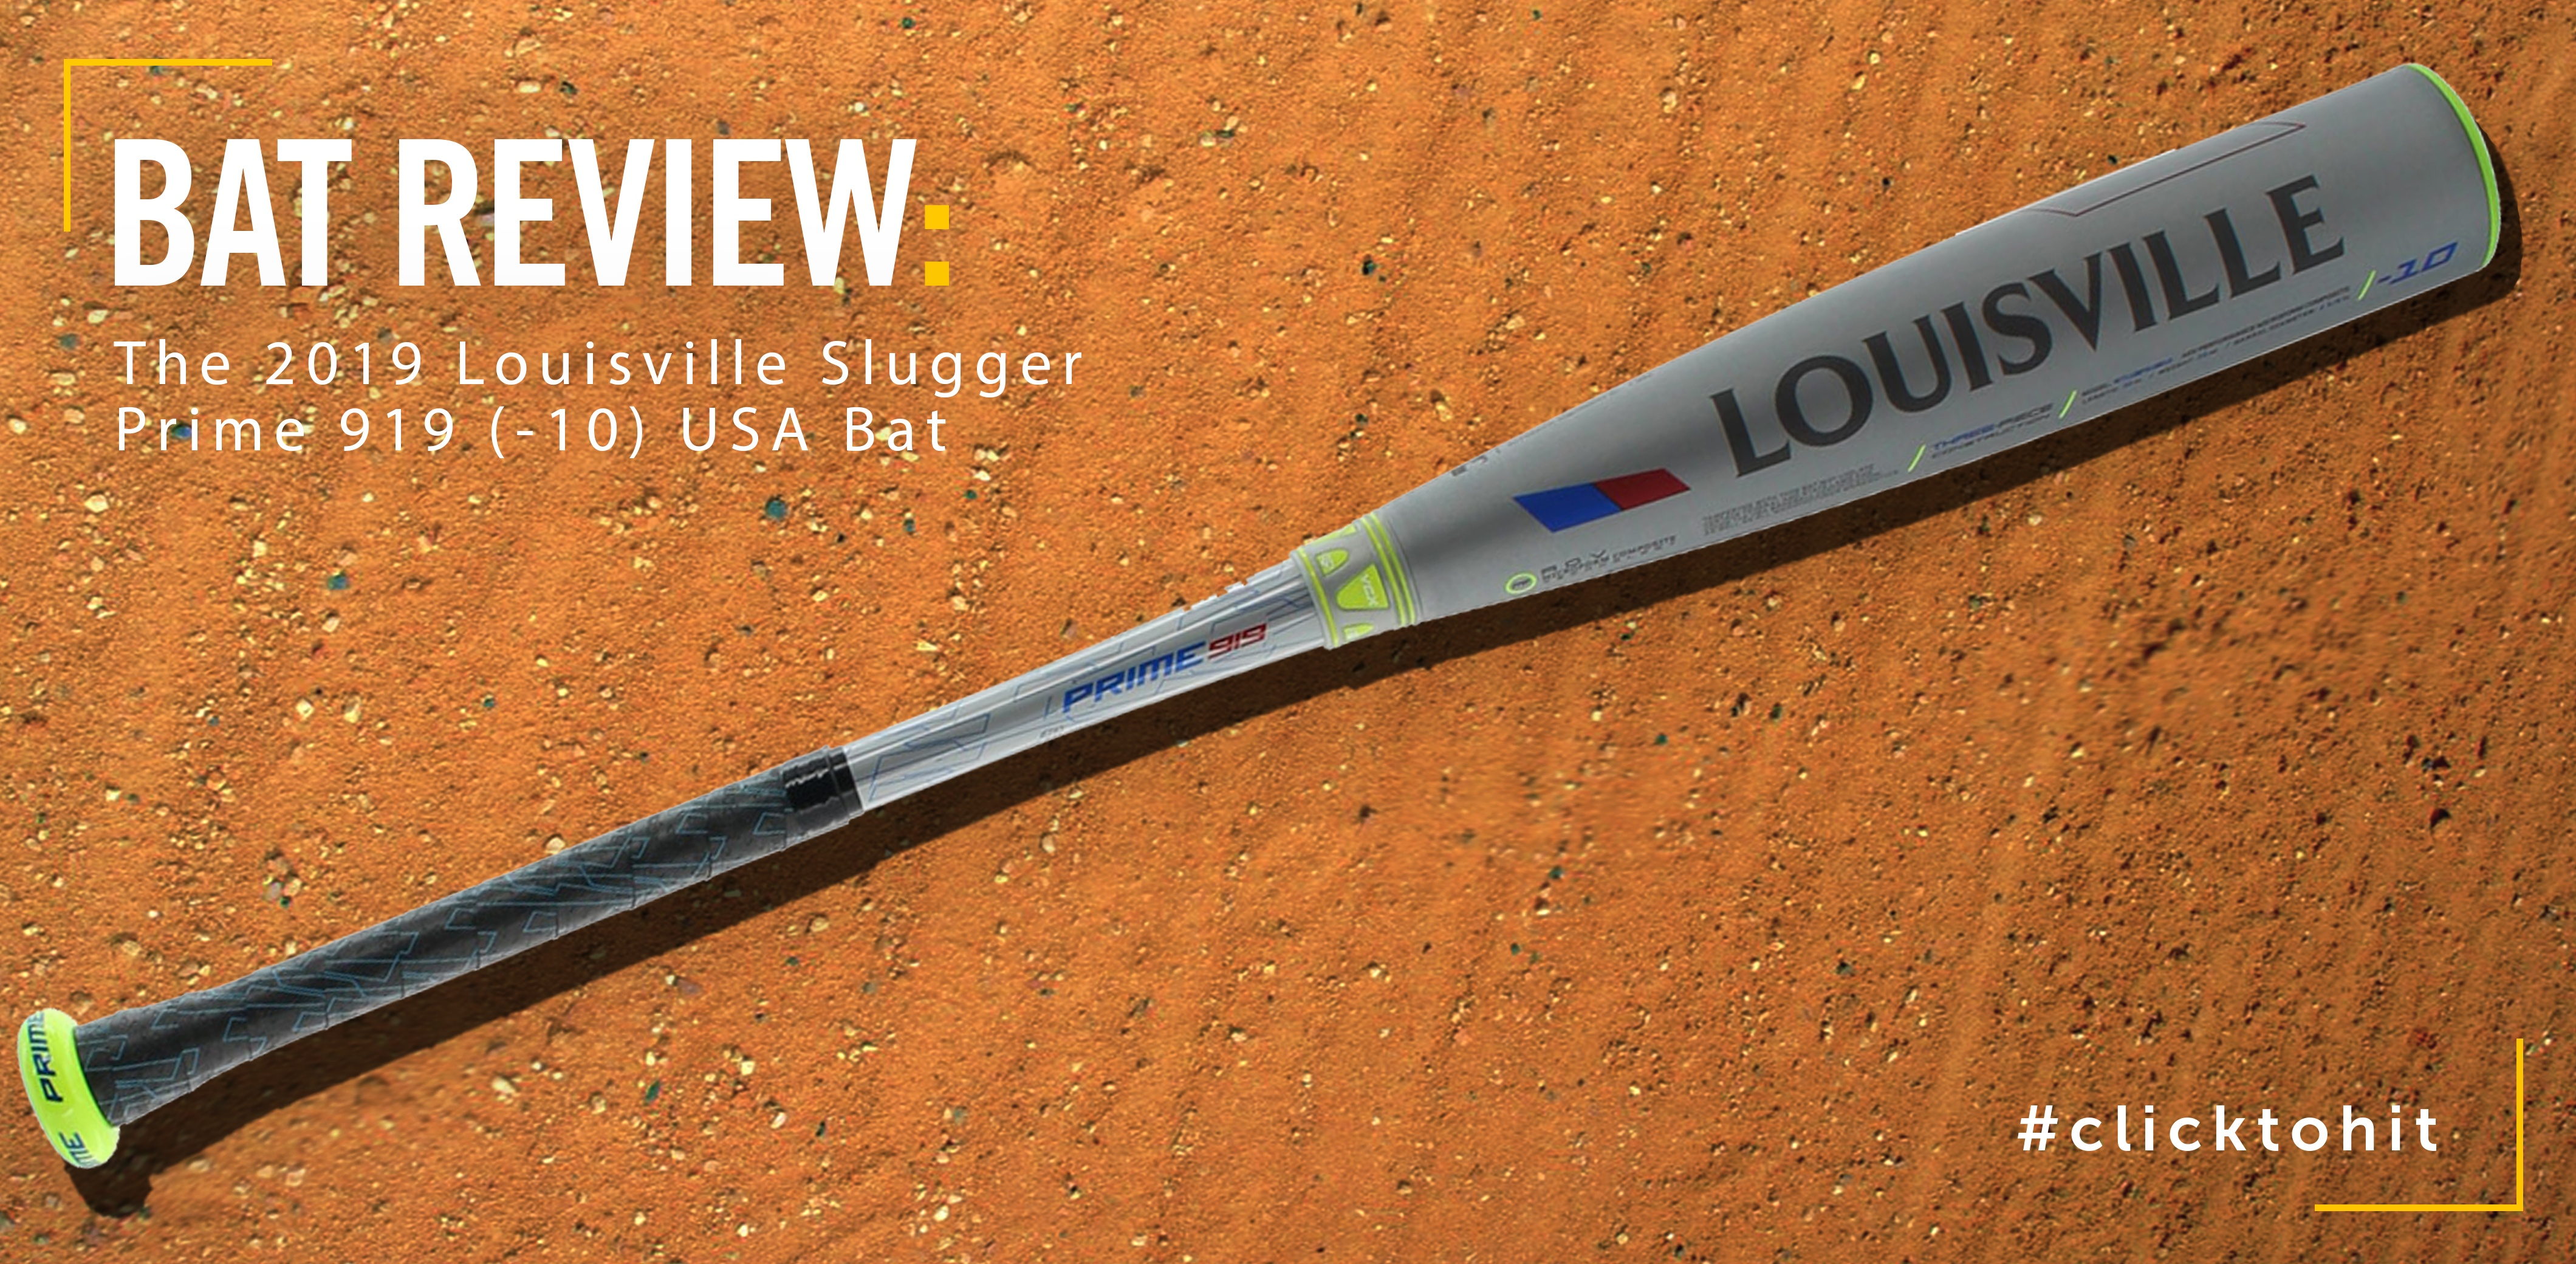 Louisville Slugger Prime 919 USA Bat